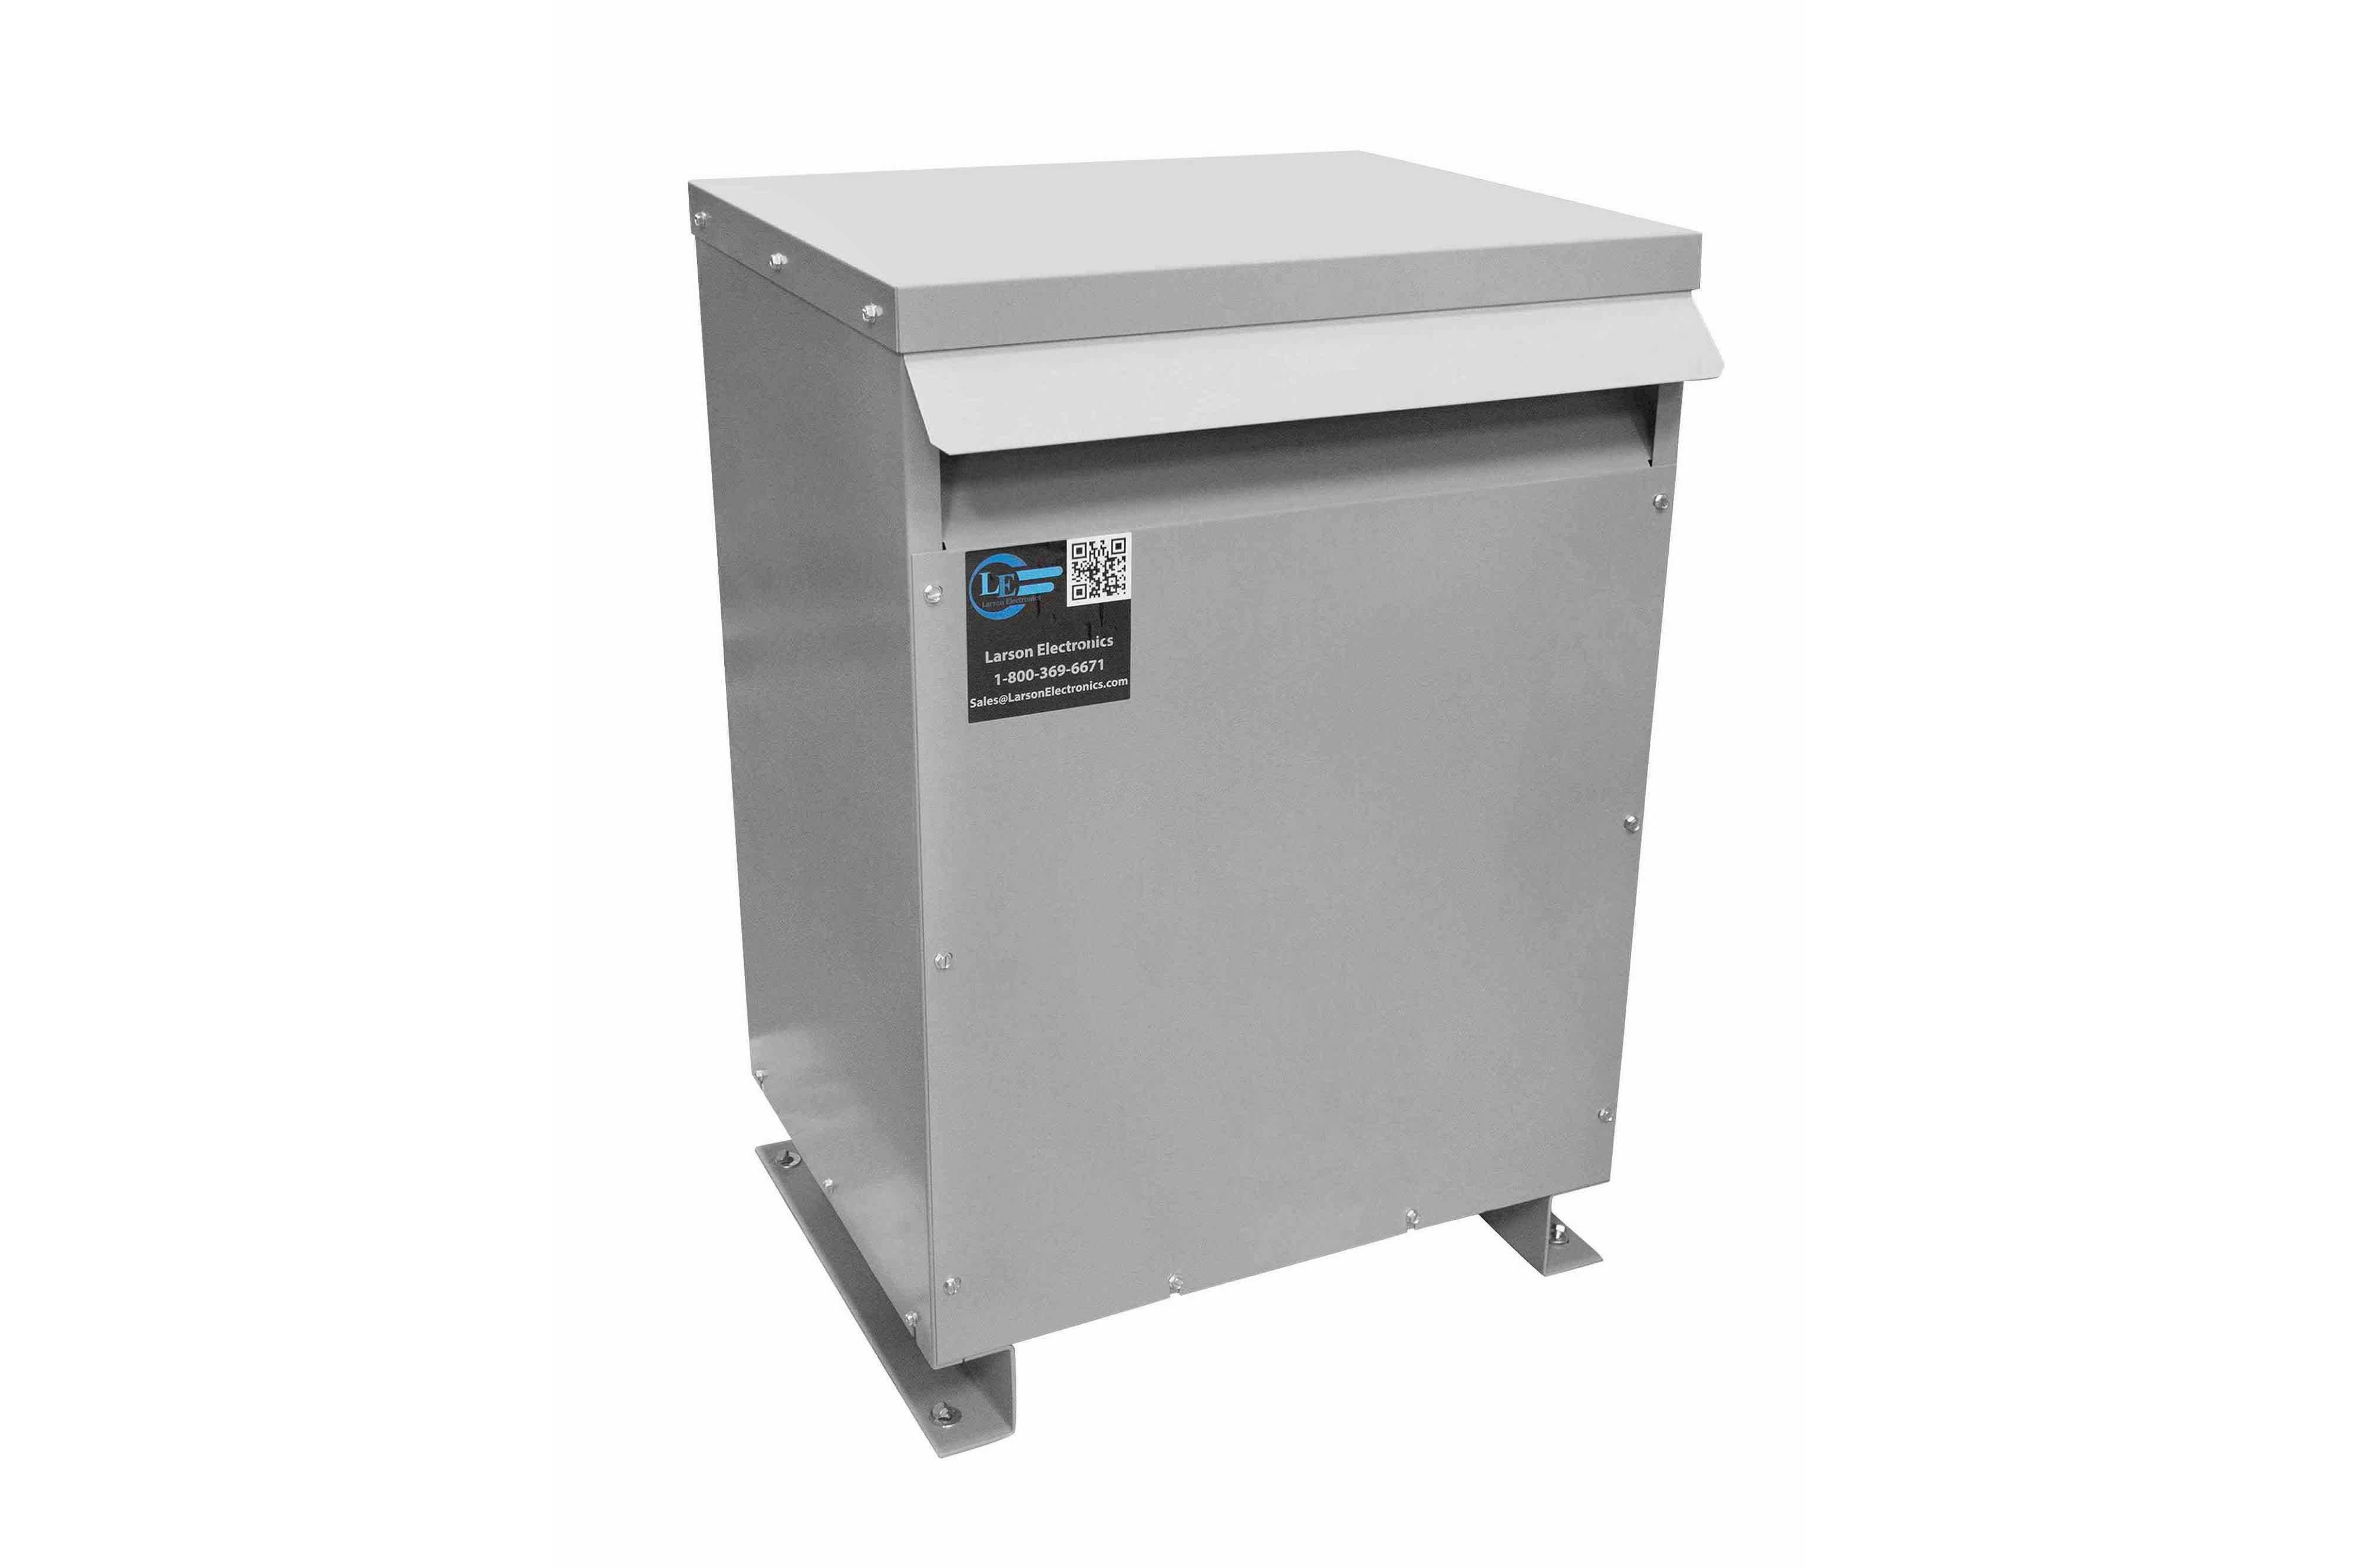 22.5 kVA 3PH Isolation Transformer, 208V Wye Primary, 600V Delta Secondary, N3R, Ventilated, 60 Hz